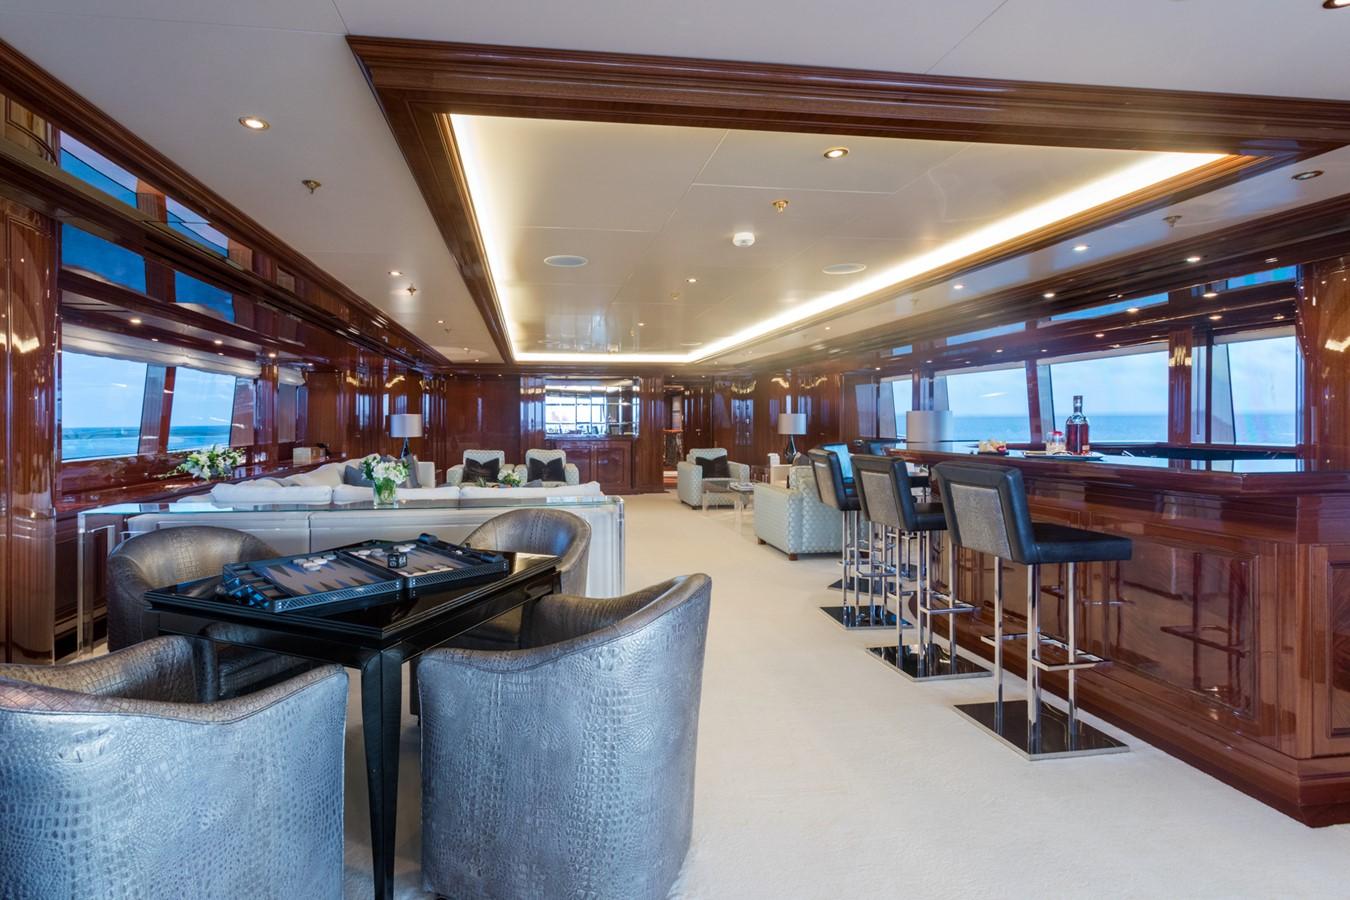 Upper Deck Salon Looking Forward - 214 CODECASA For Sale